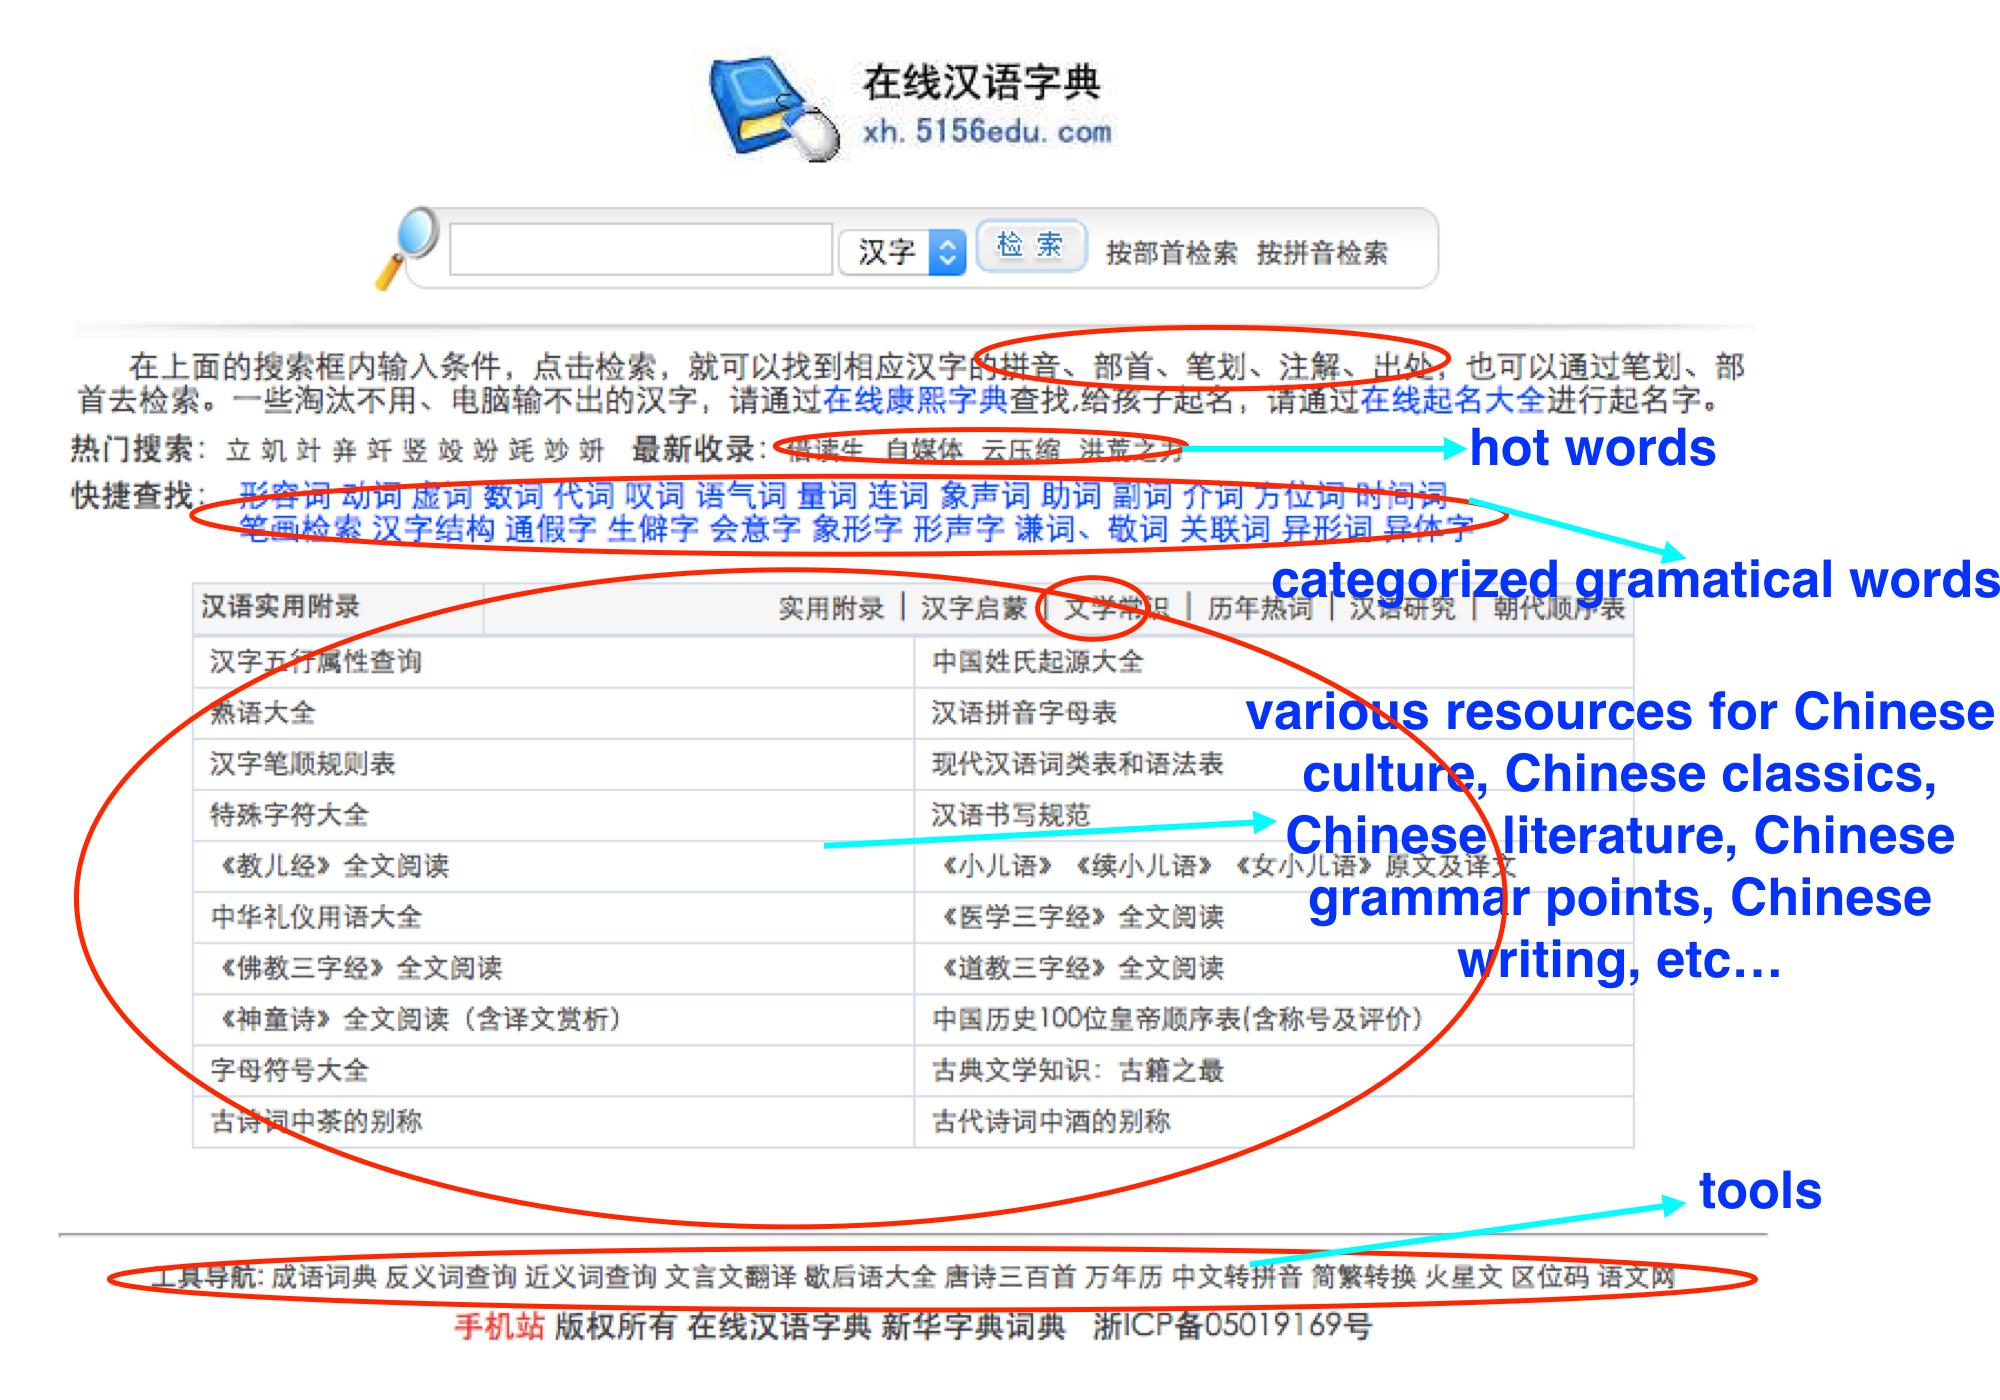 Online Chinese Dictionary, 在线汉语词典